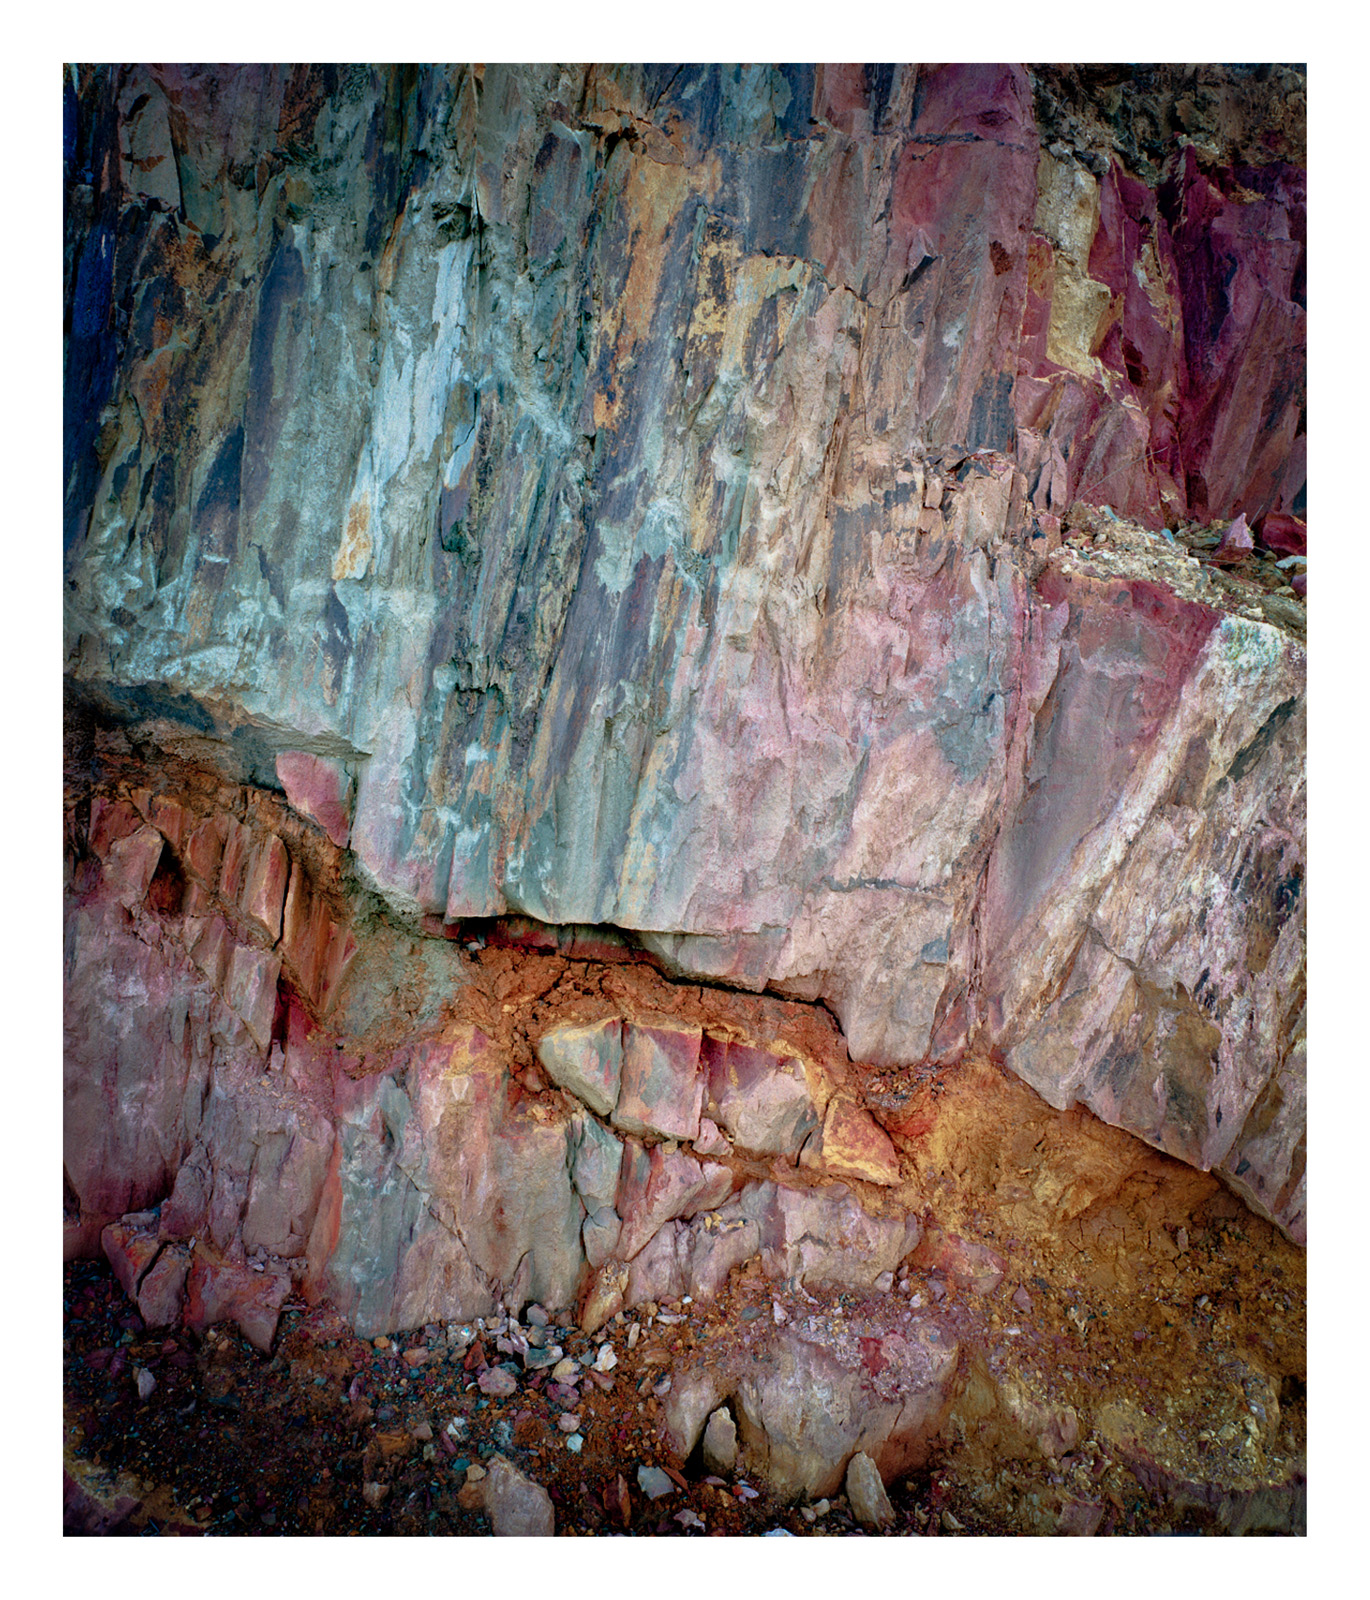 TasmaniaQueenstowncolourrocks.jpg